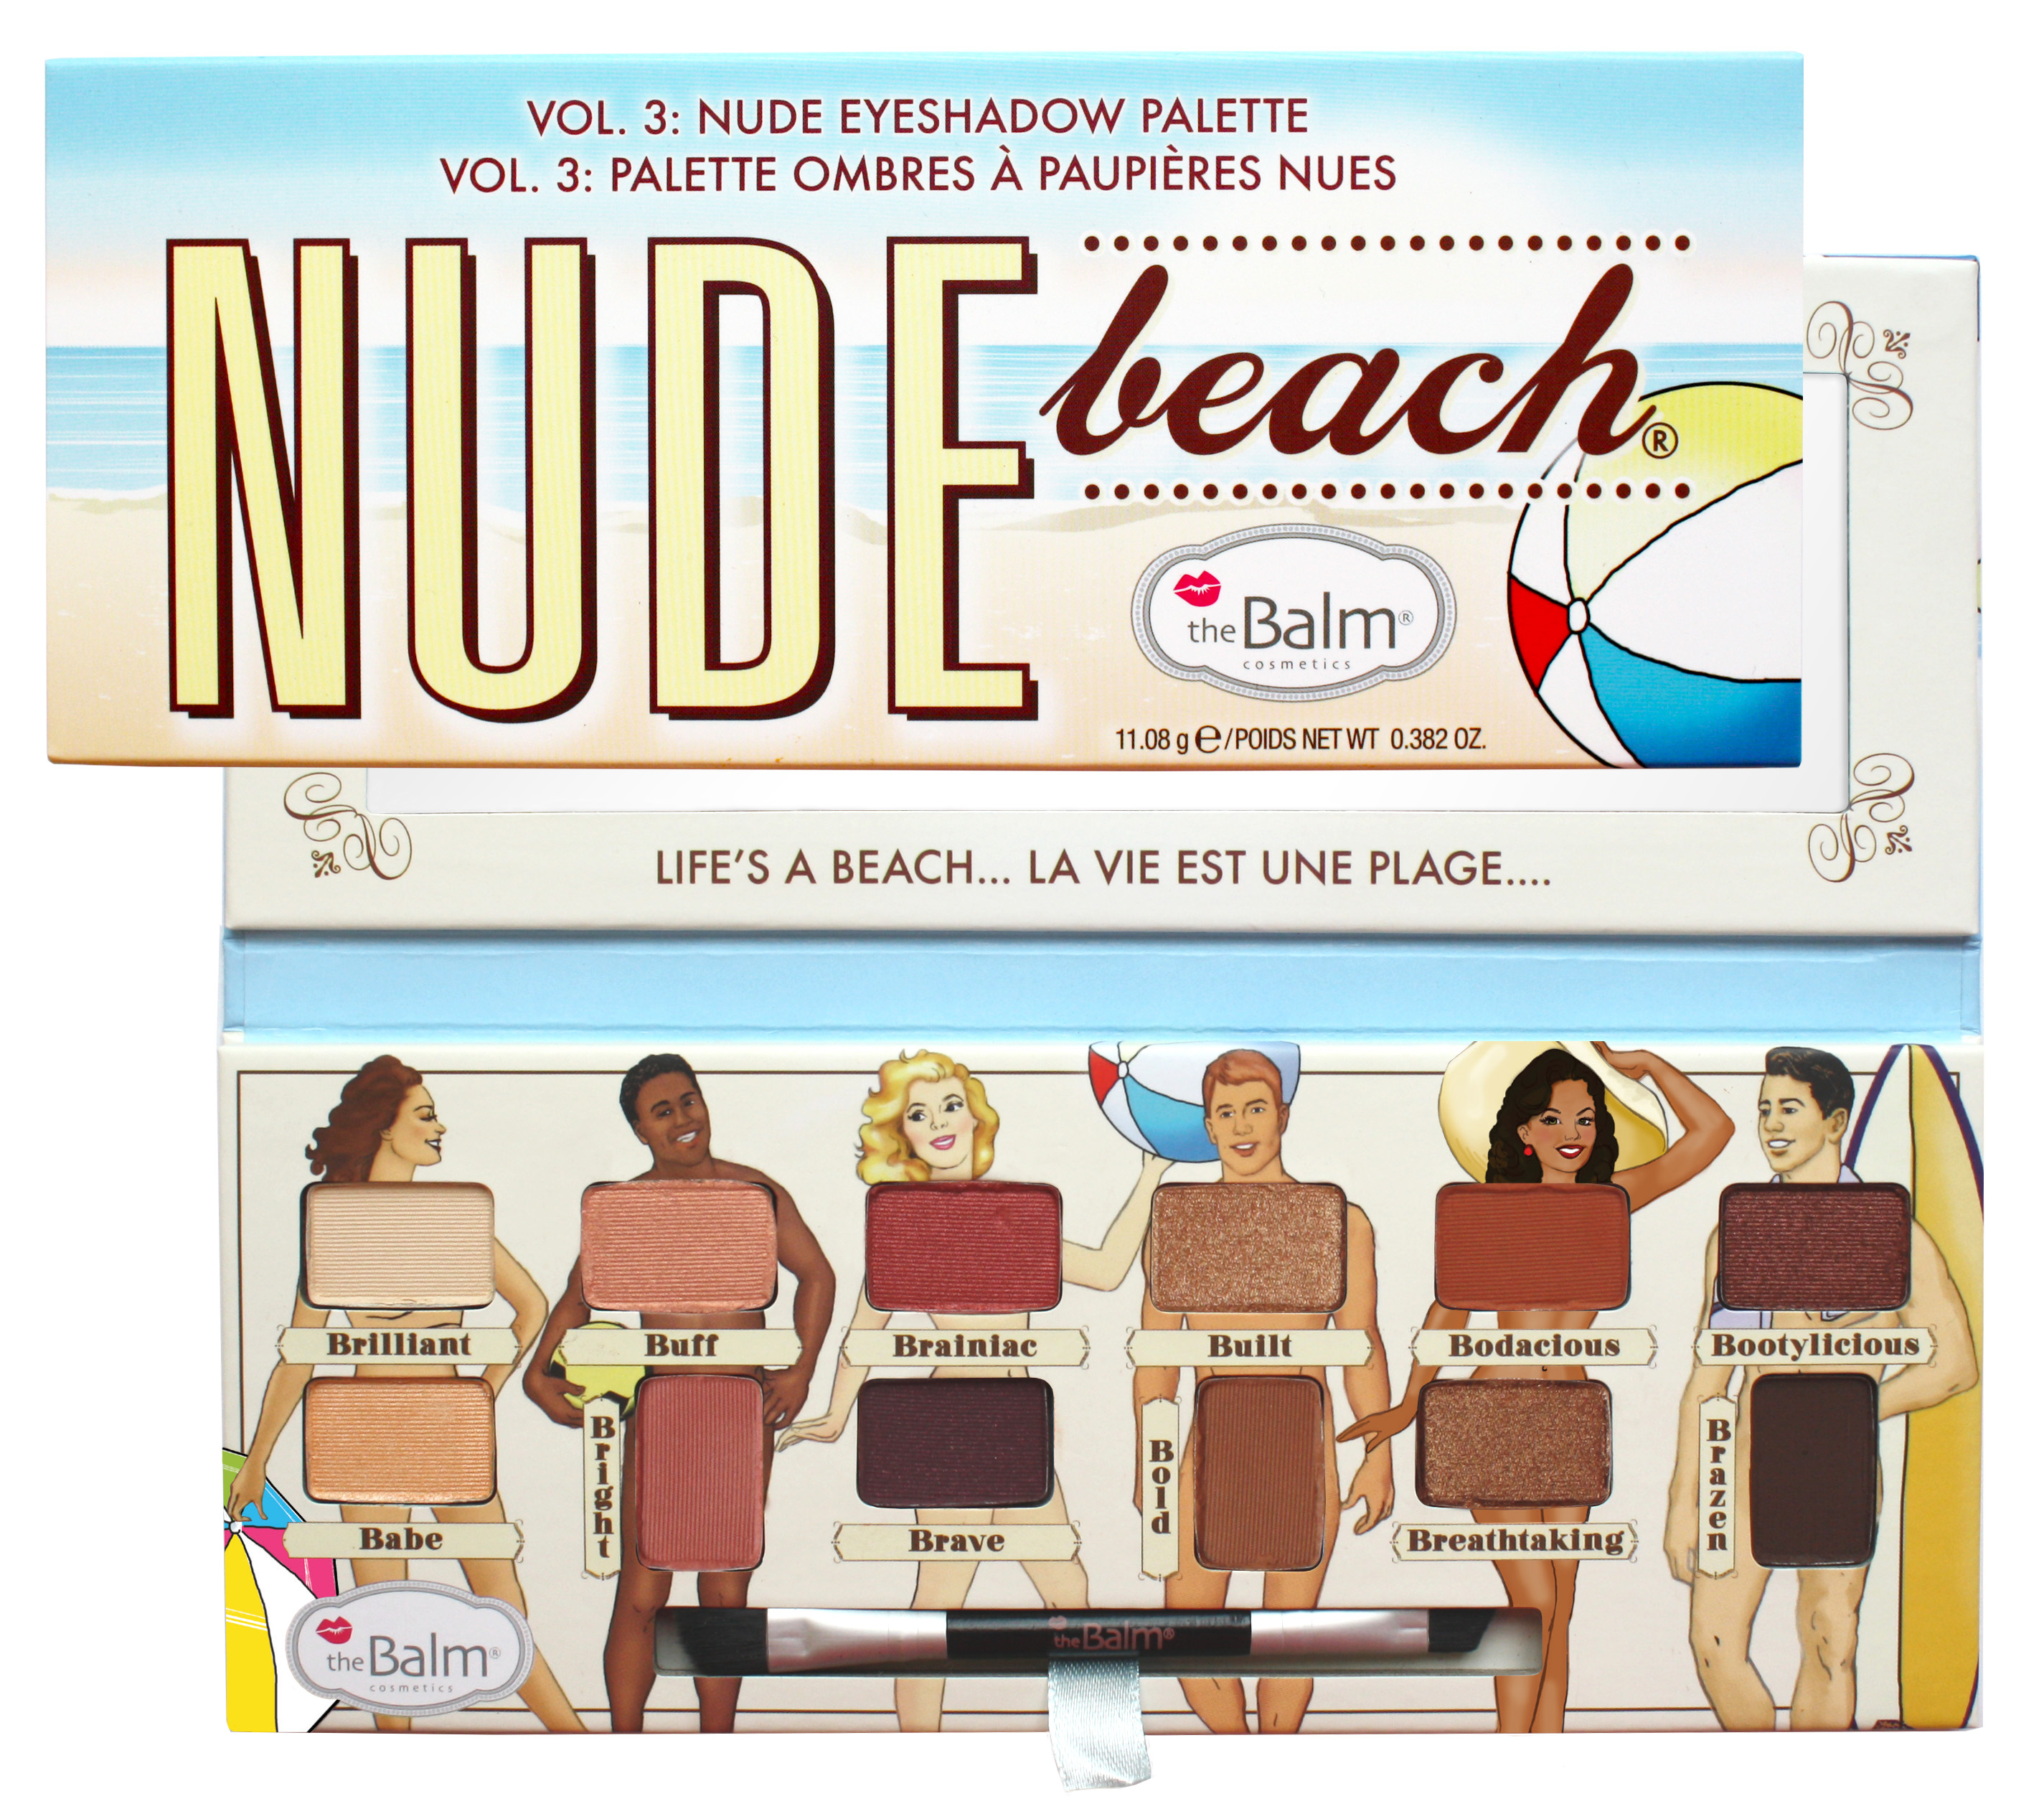 Nude Beach Eyeshadow Nude Beach Eyeshadow Palette